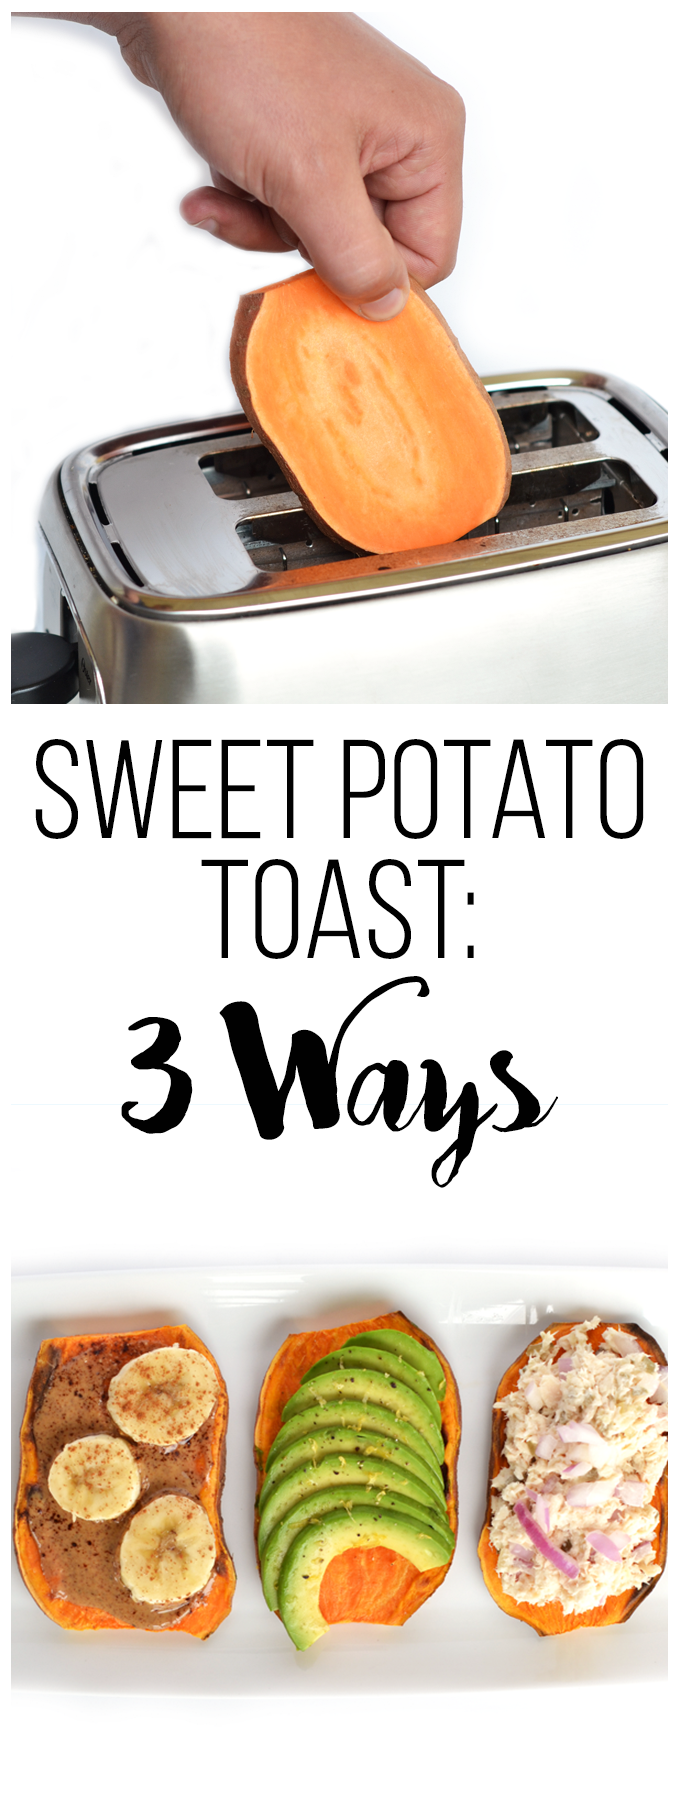 227 best I know my way around the kitchen images on Pinterest ...